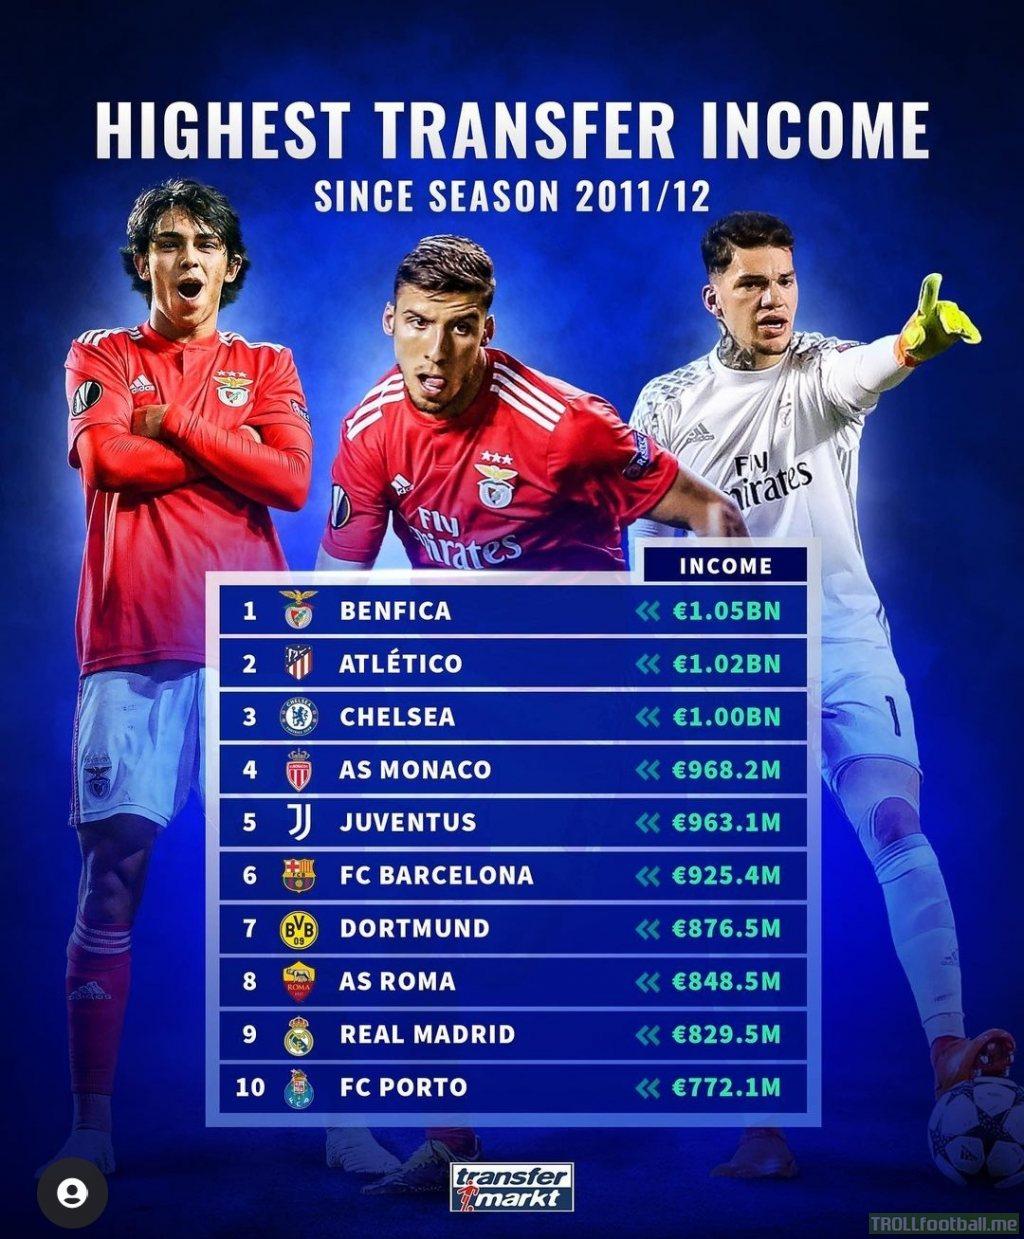 Highest transfer income since season 2011/12